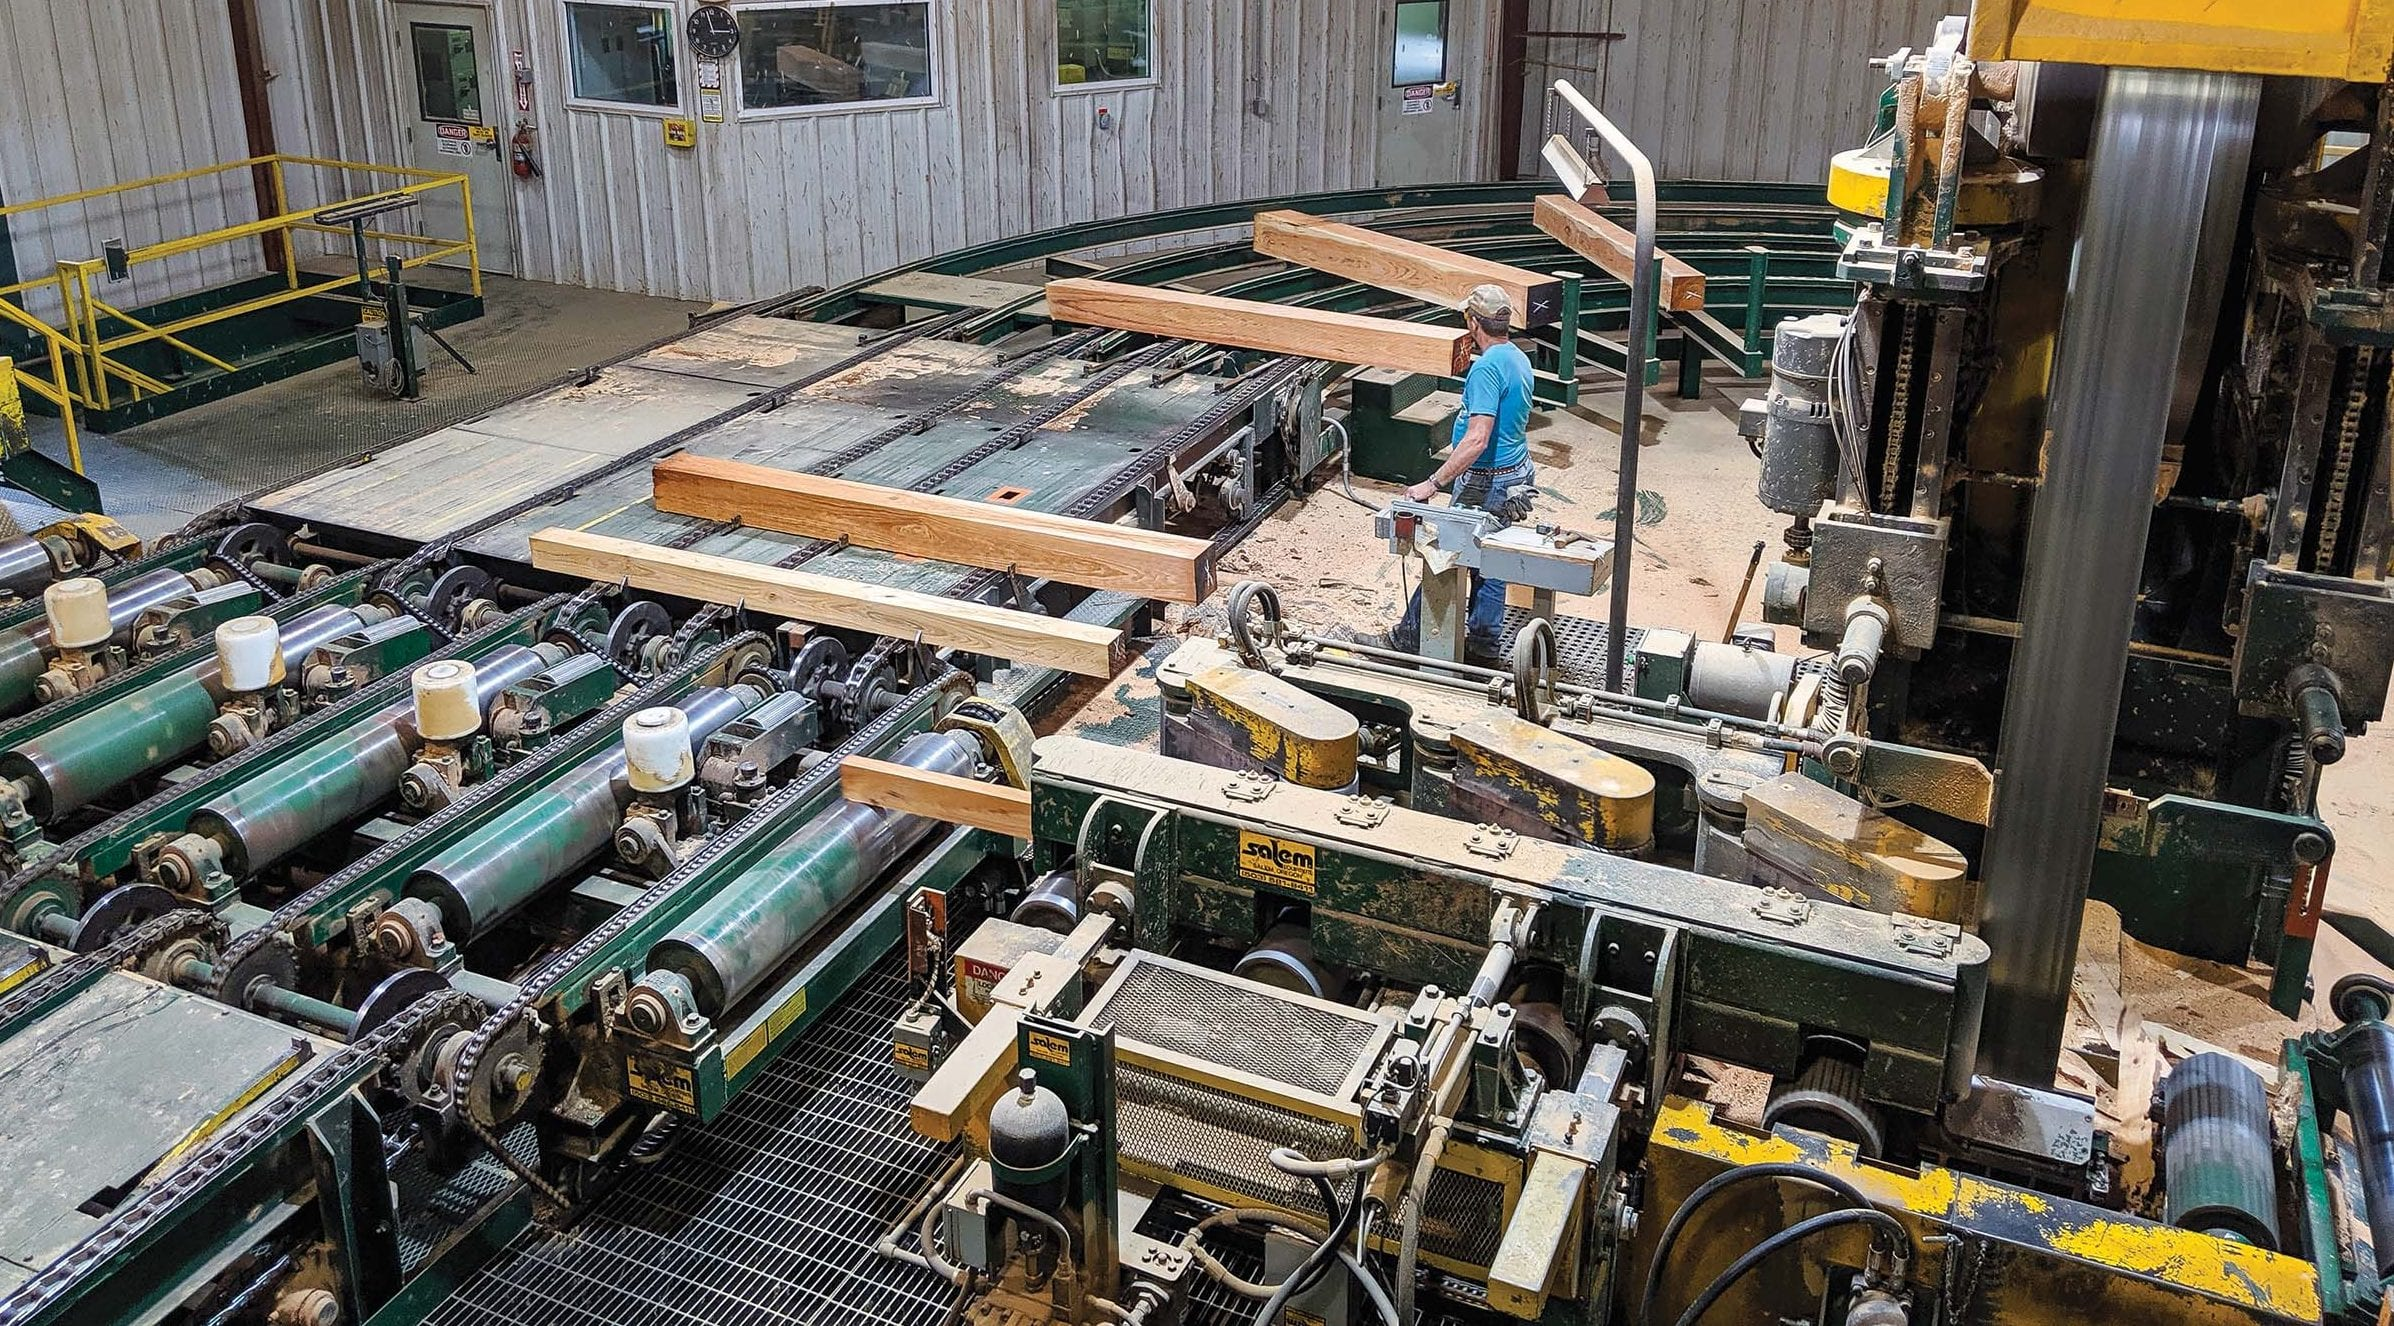 2019 OFBF Board trip to Marietta Ohio - Haessly Hardwood Lumber Company